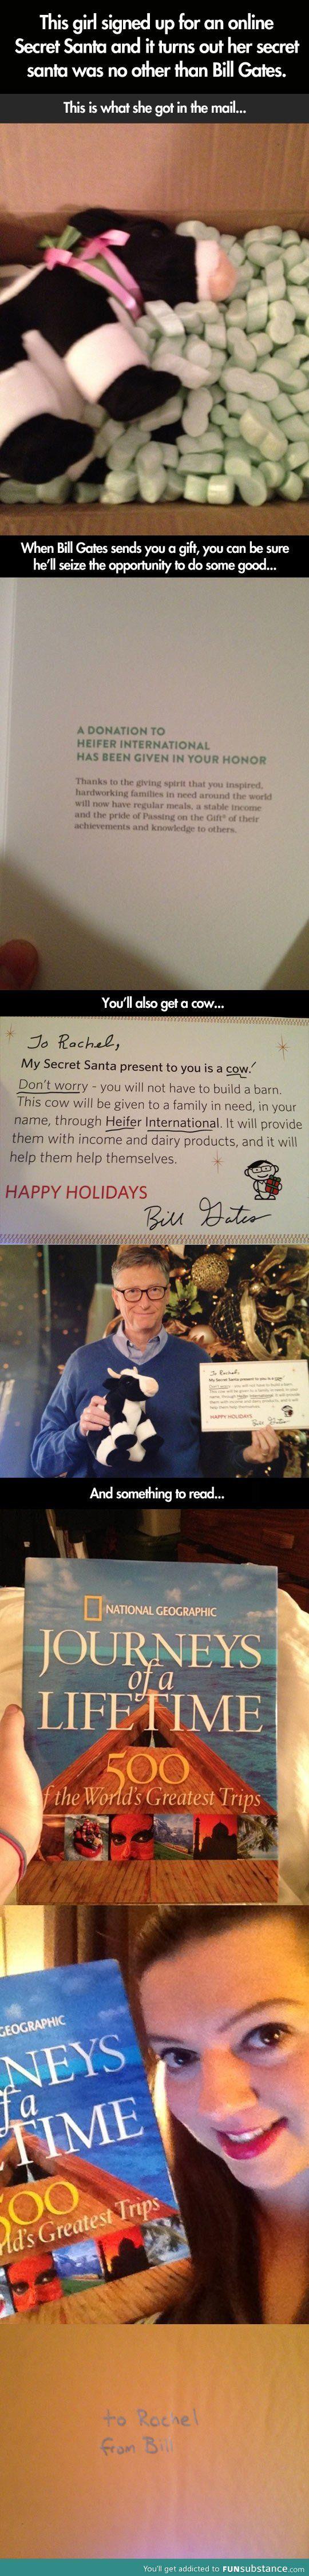 What Bill Gates Gave a Random Stranger in an online Secret Santa